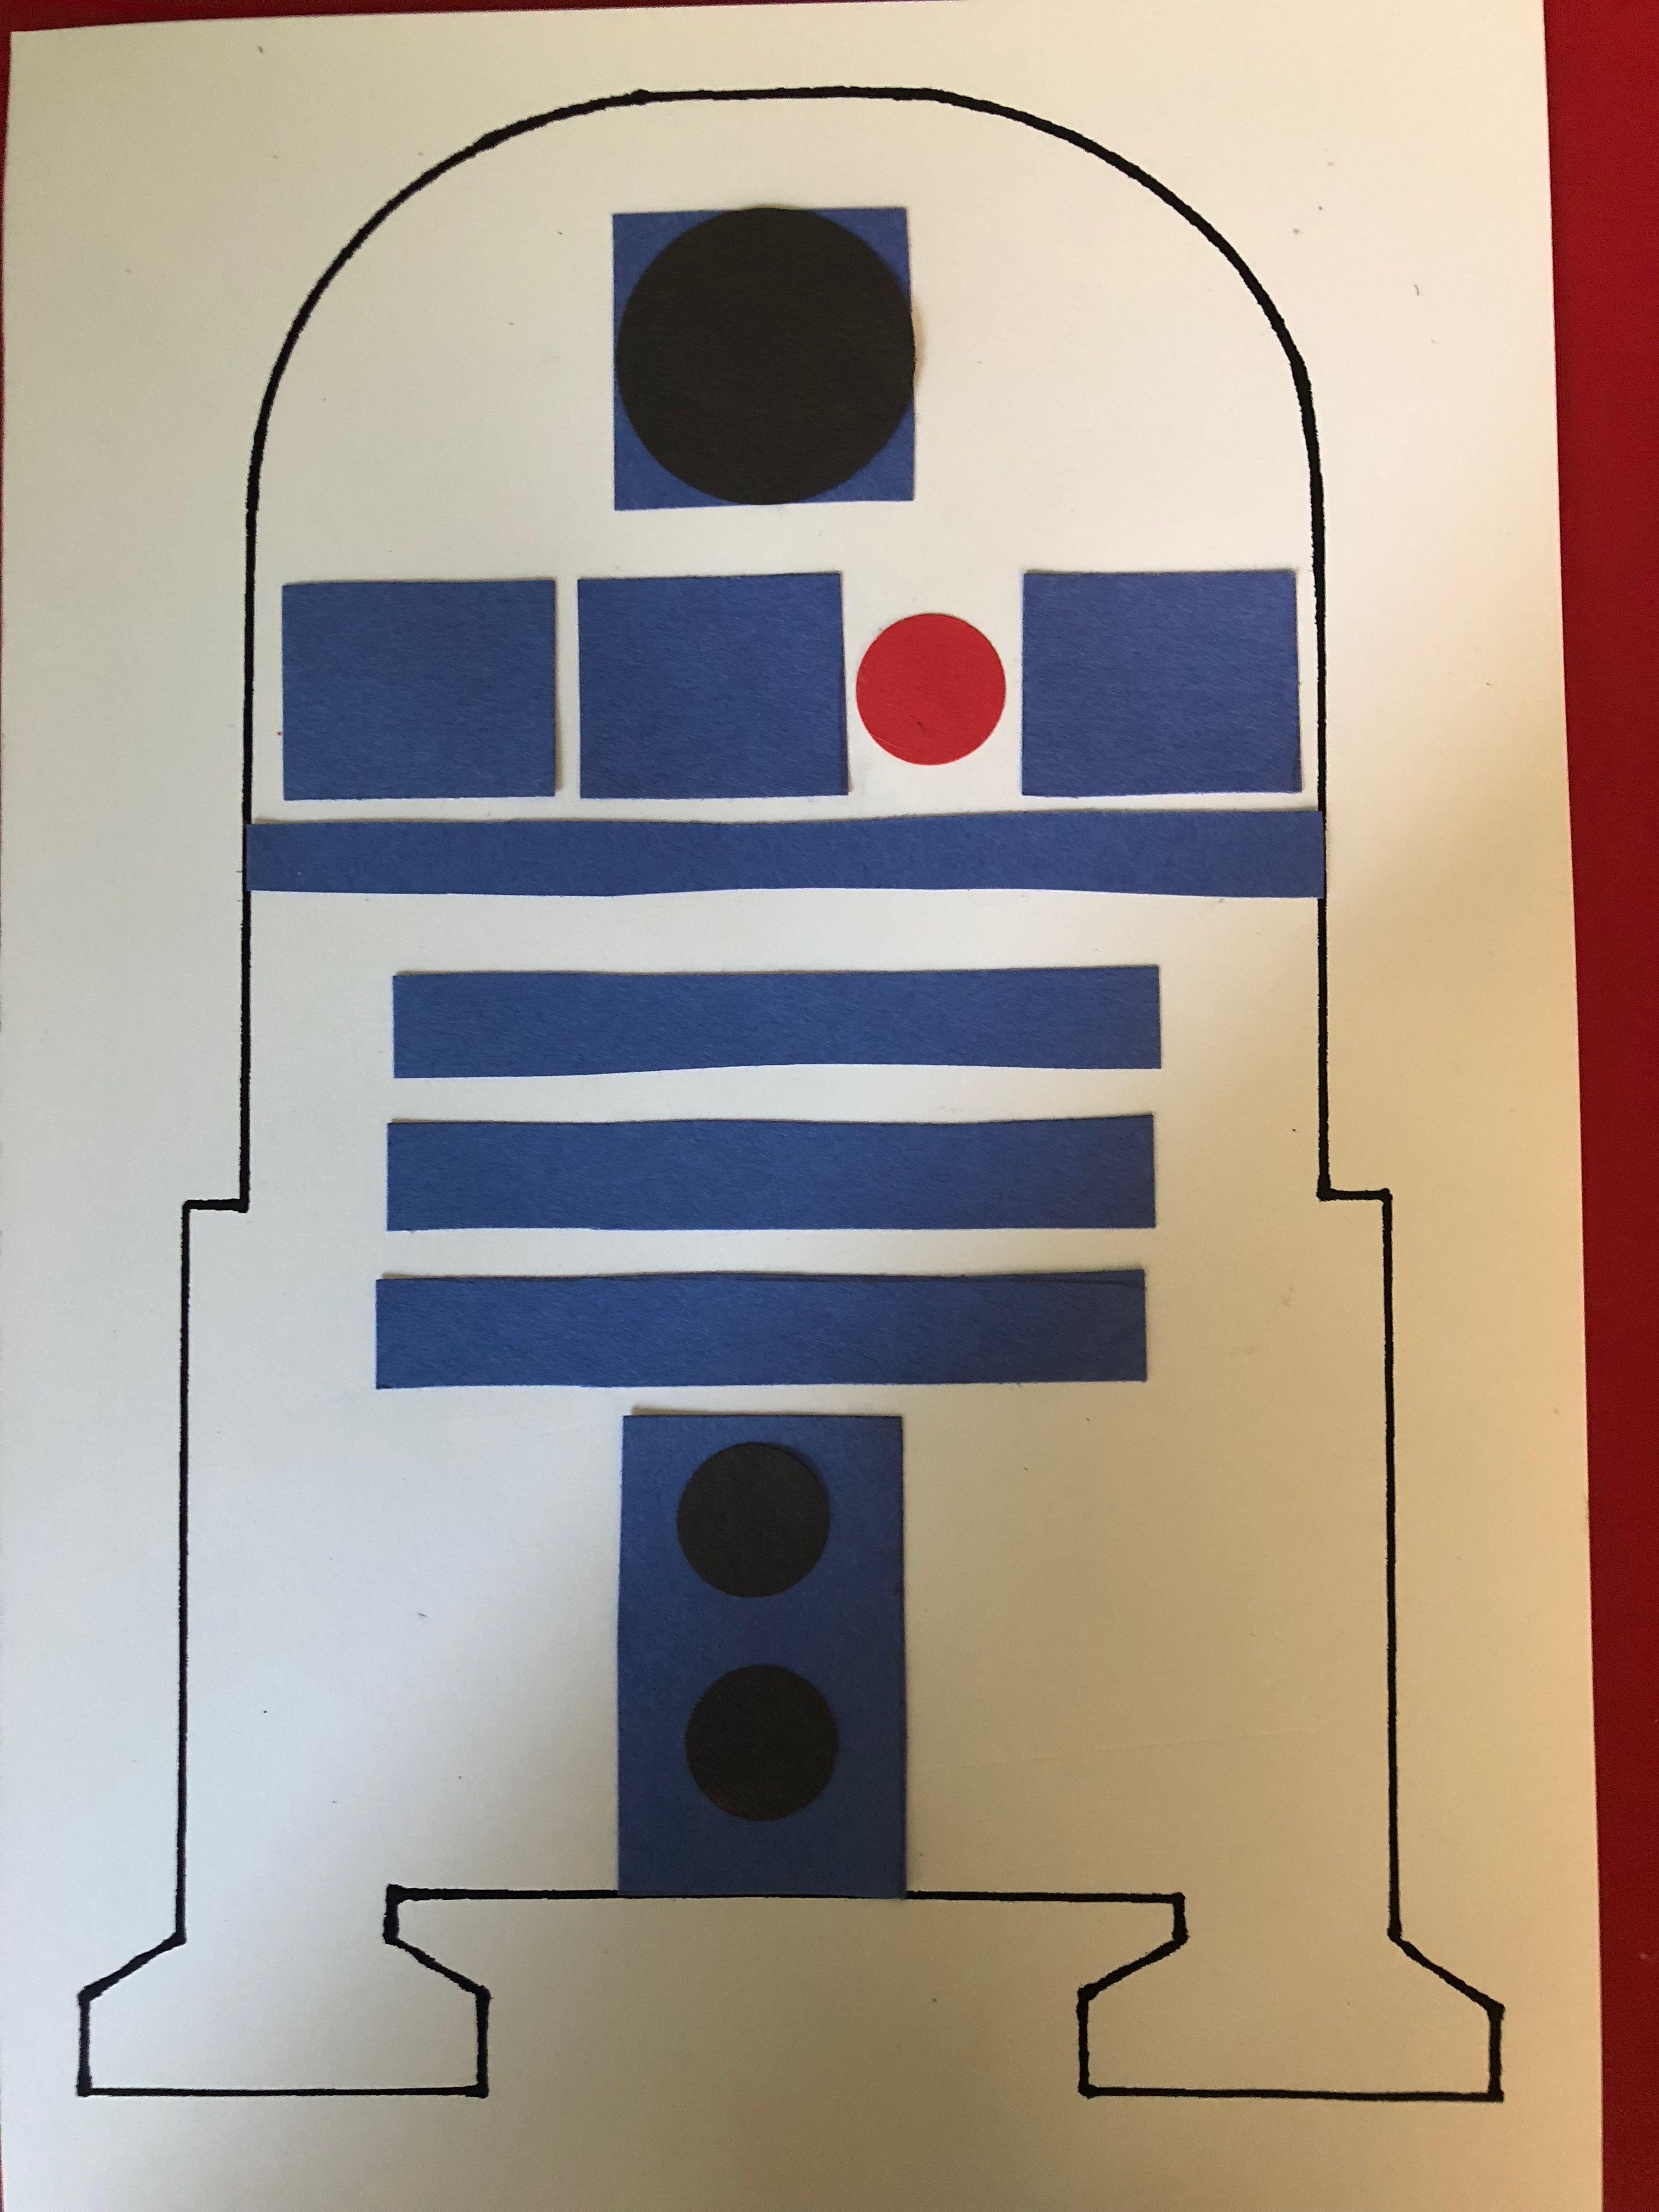 R2D2 Star Wars Day Star wars day, Projects, Symbols